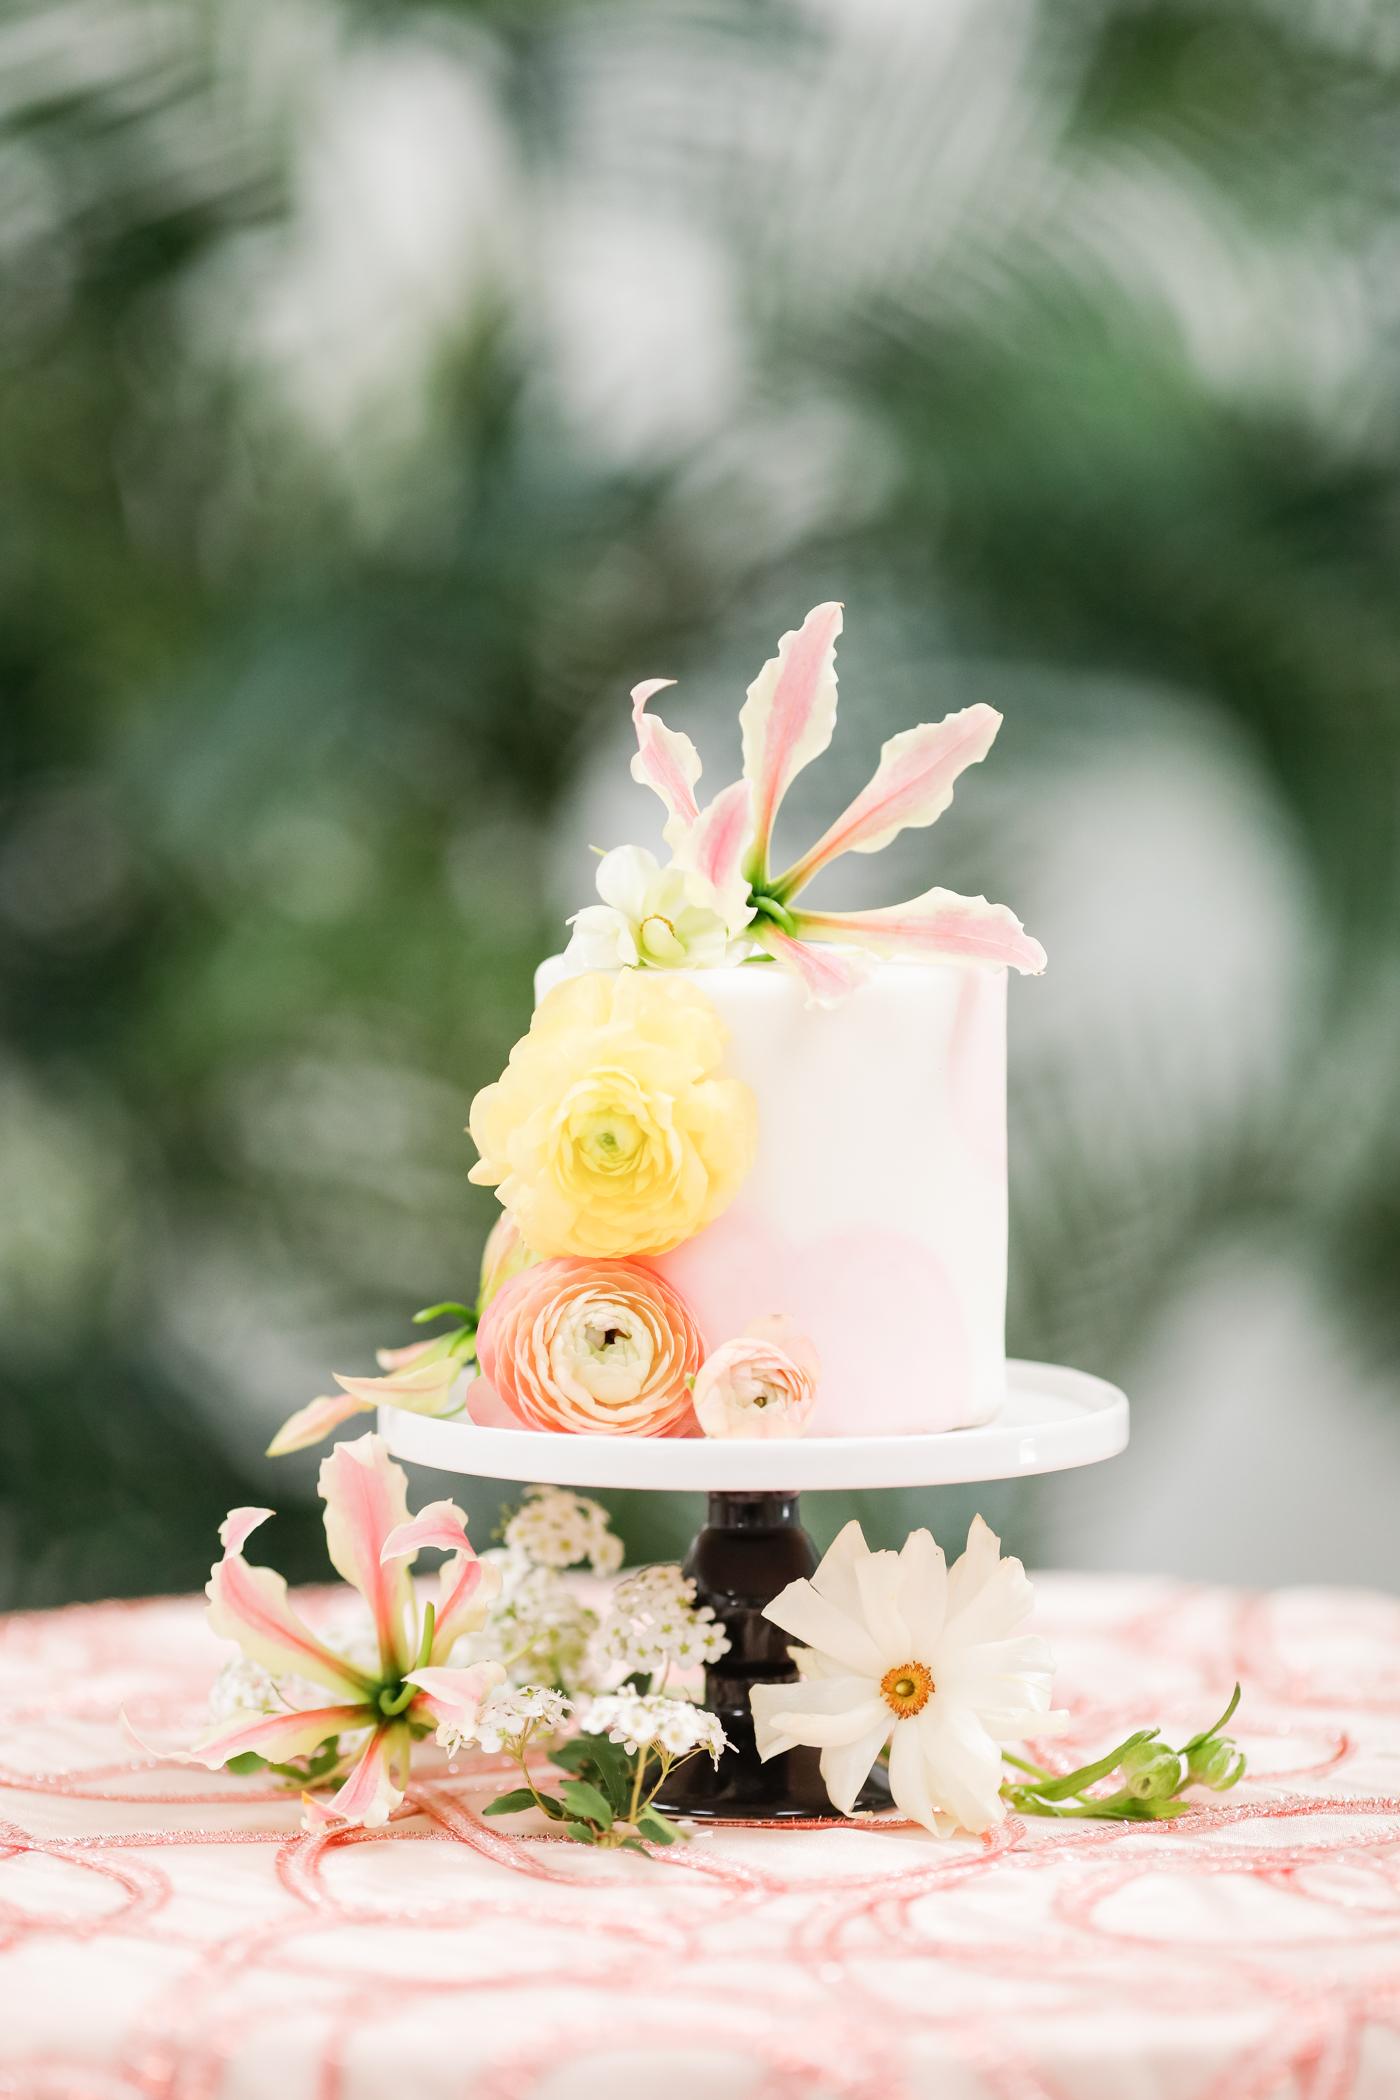 Cute and elegant wedding cake